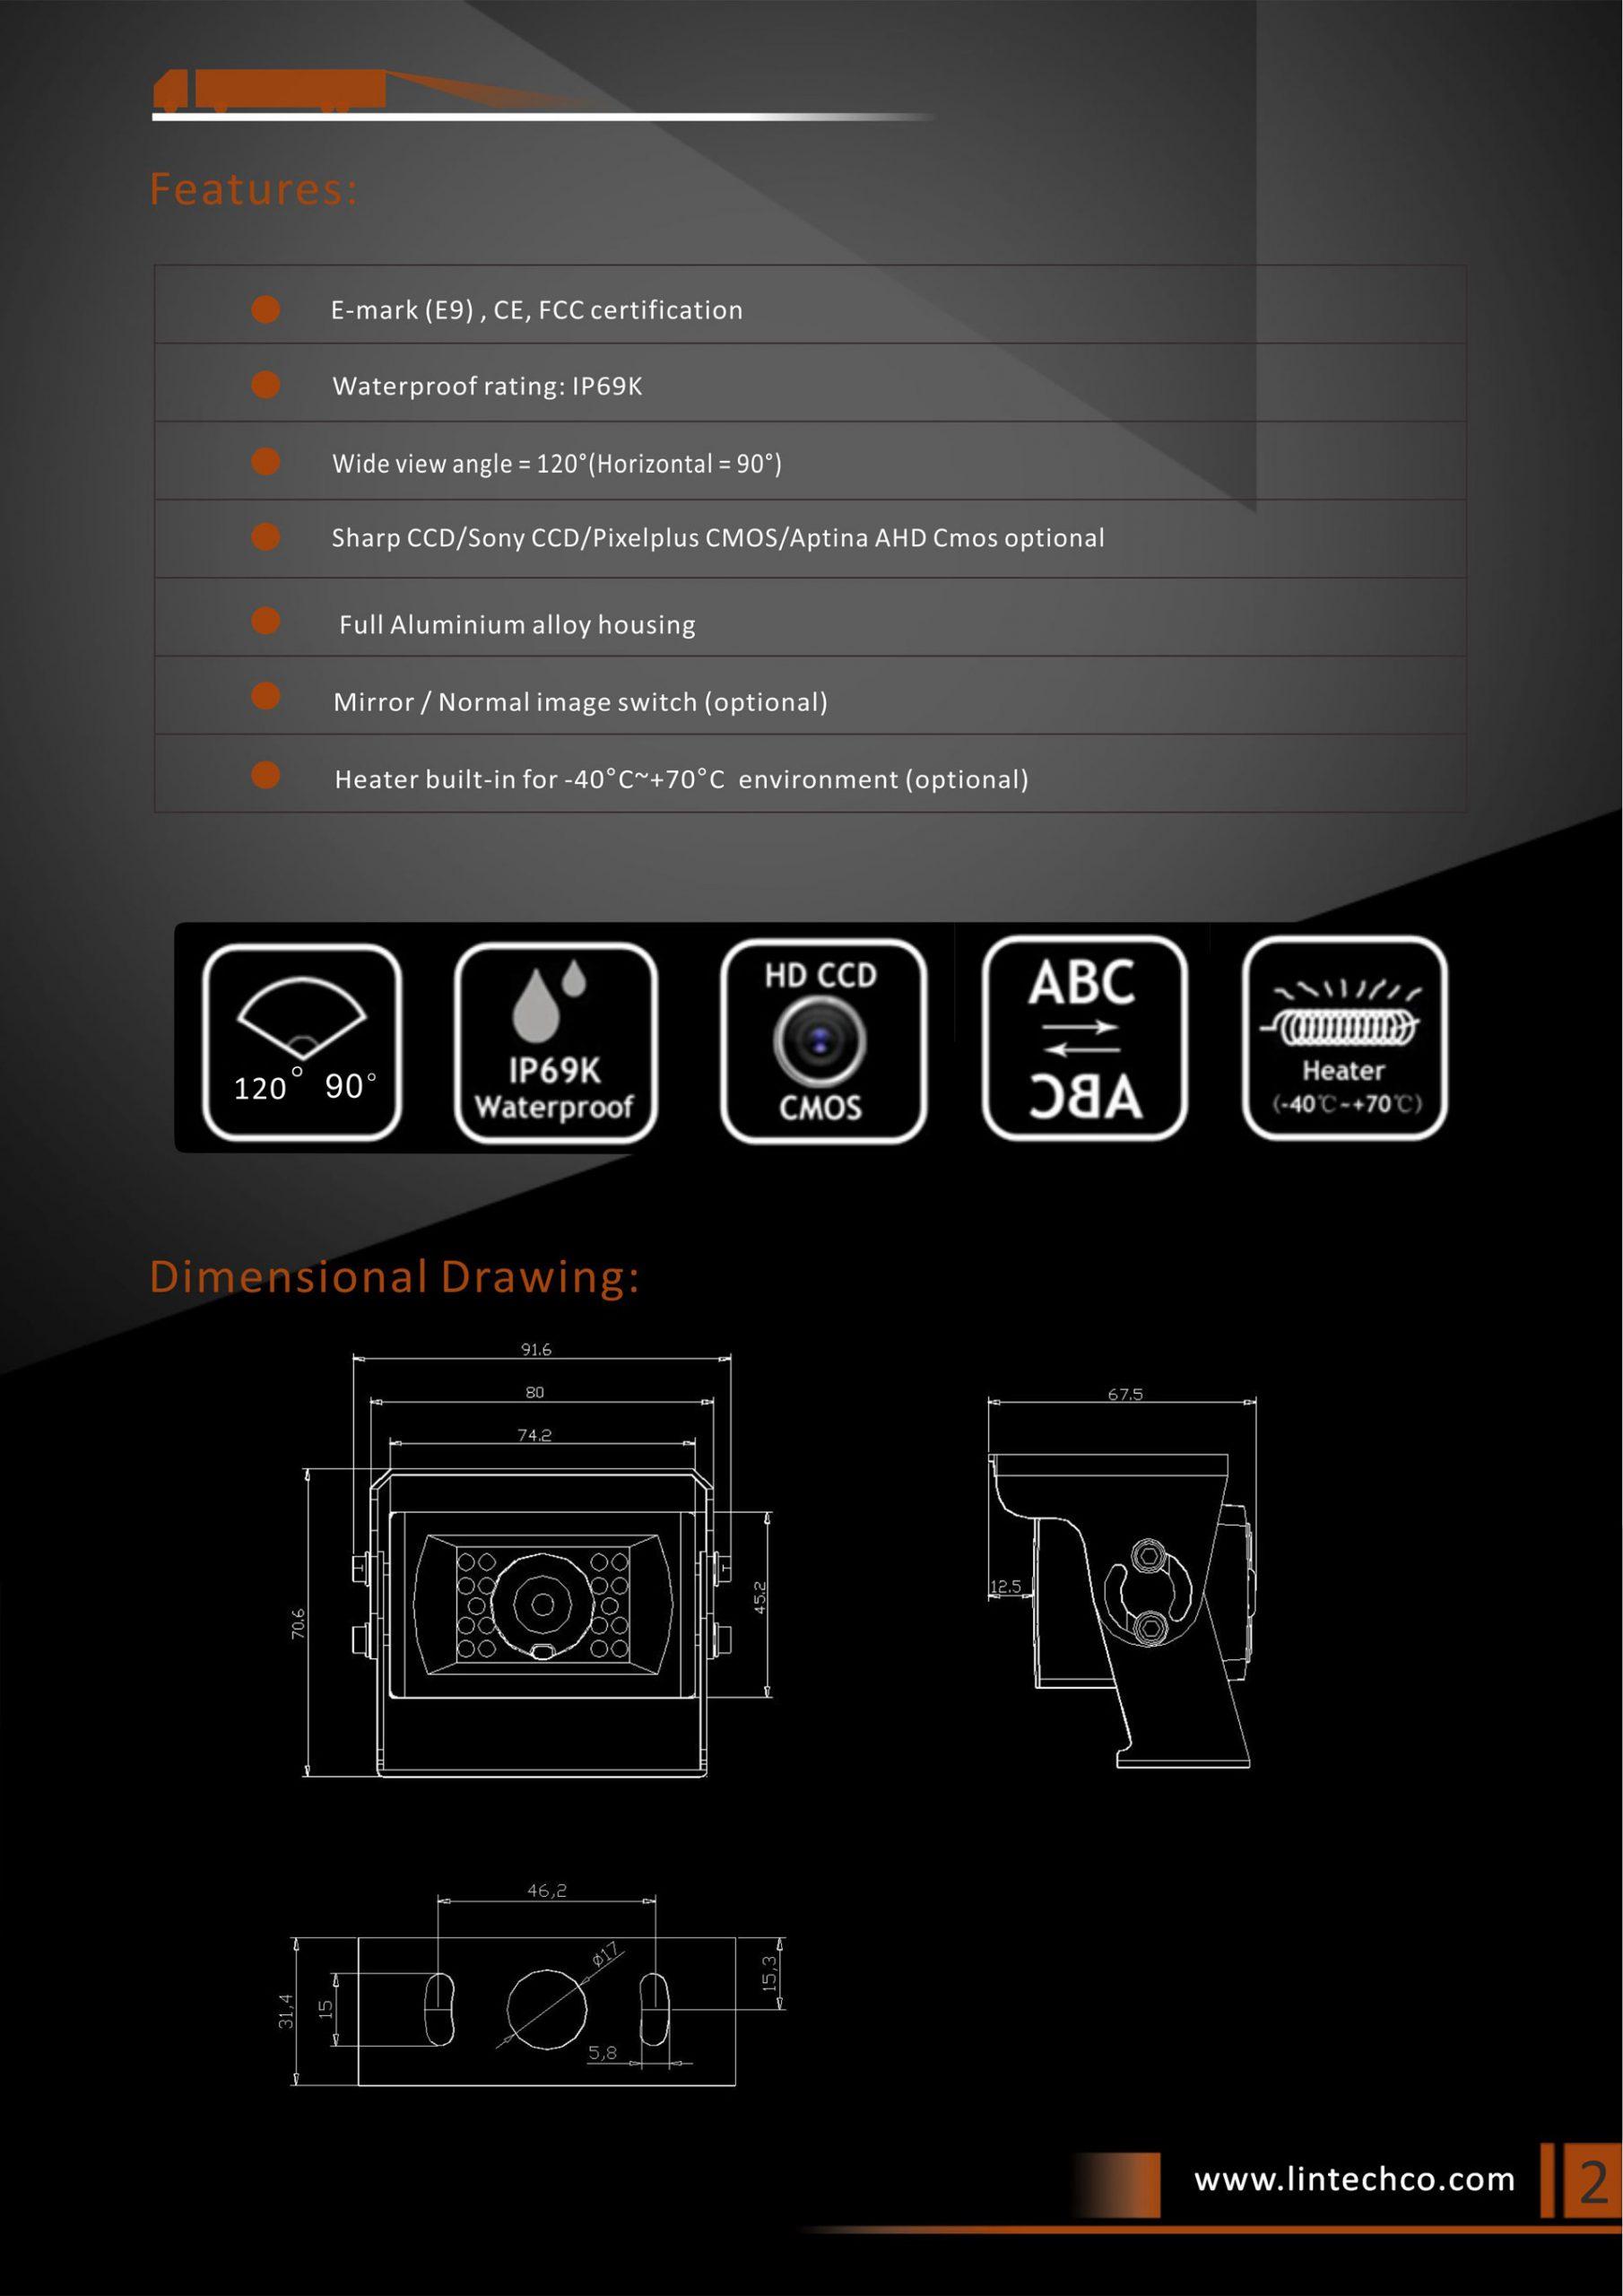 2.Heavy-Duty-18pcs-IR-LED-Night-Vision-IP69K-Waterproof-Backup-Camera